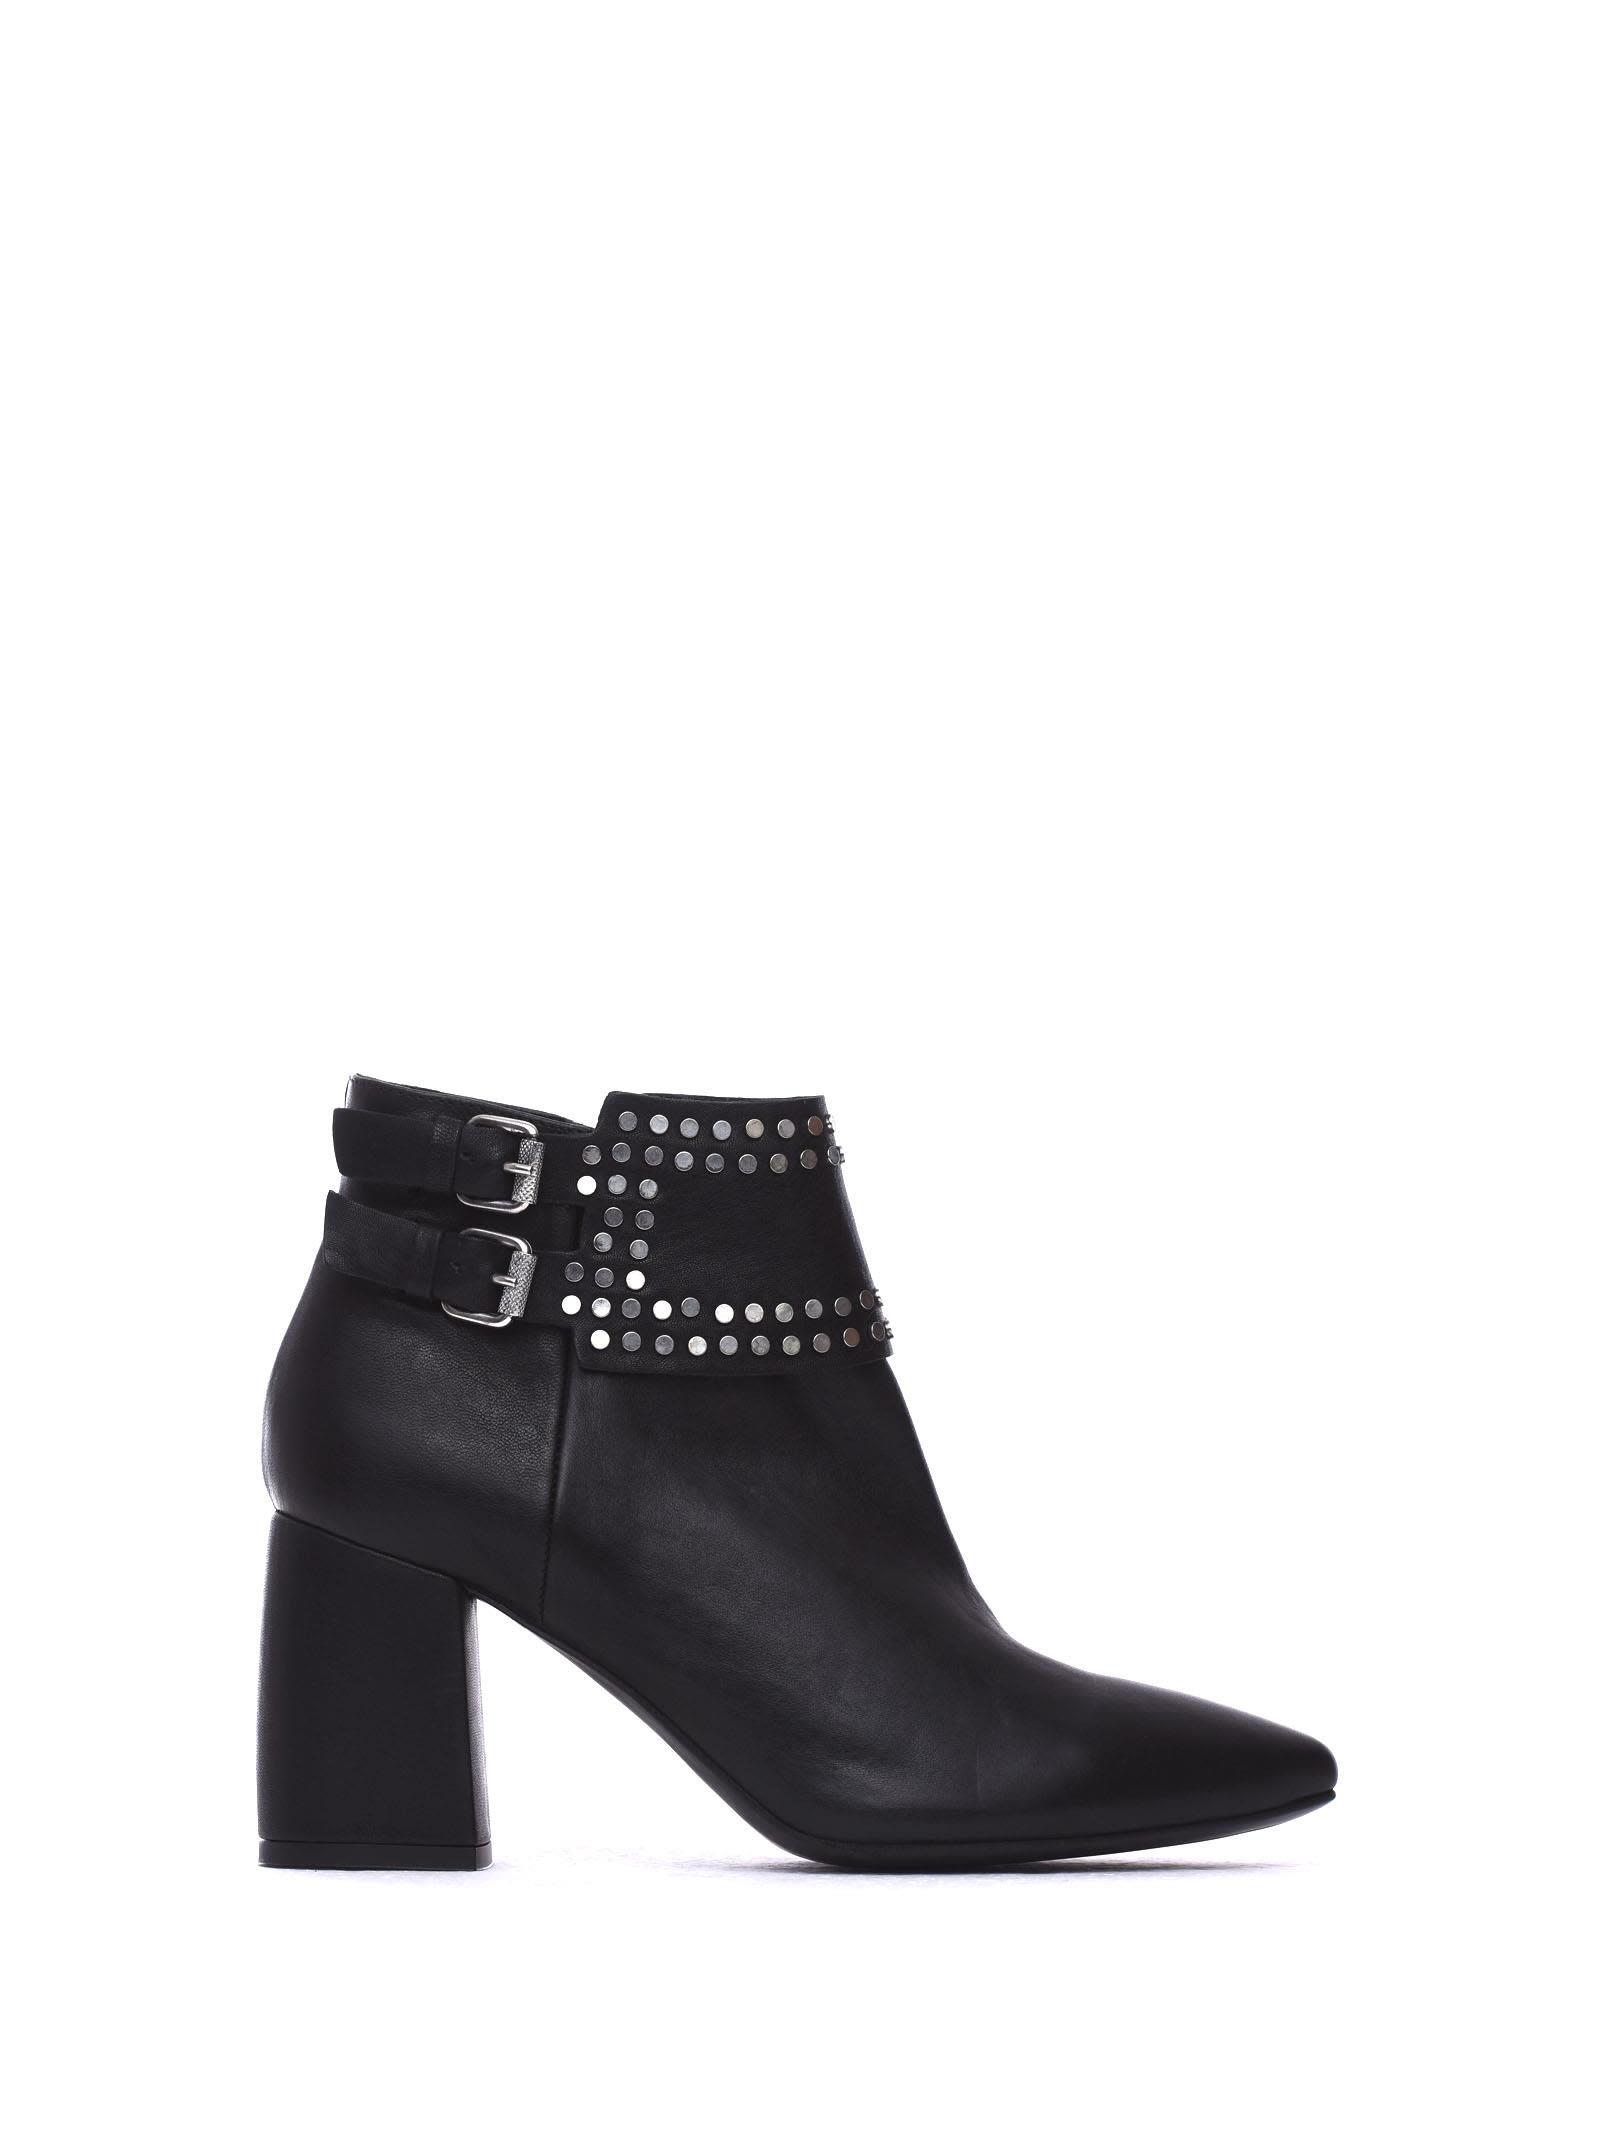 Janet & Janet Matilde Black Ankle Boots